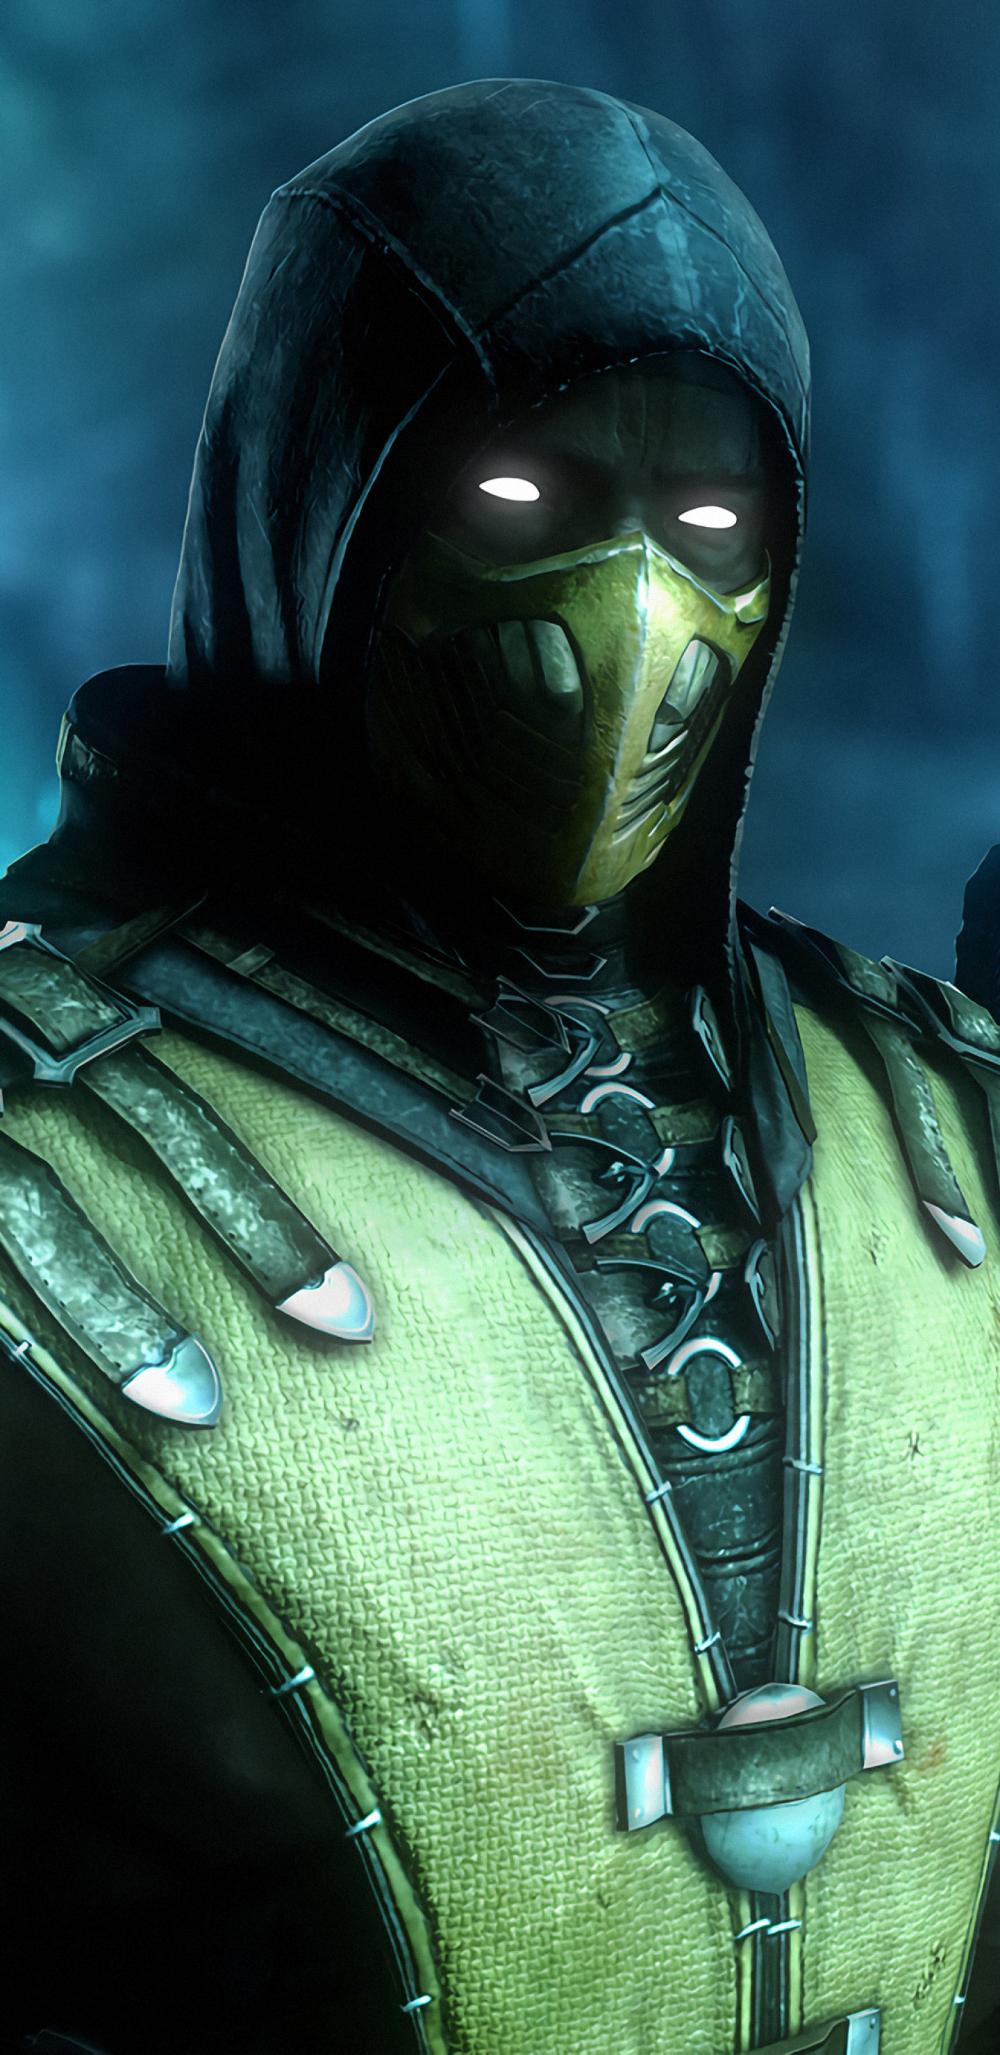 Sub Zero And Scorpion Mortal Kombat in 2020 Scorpion